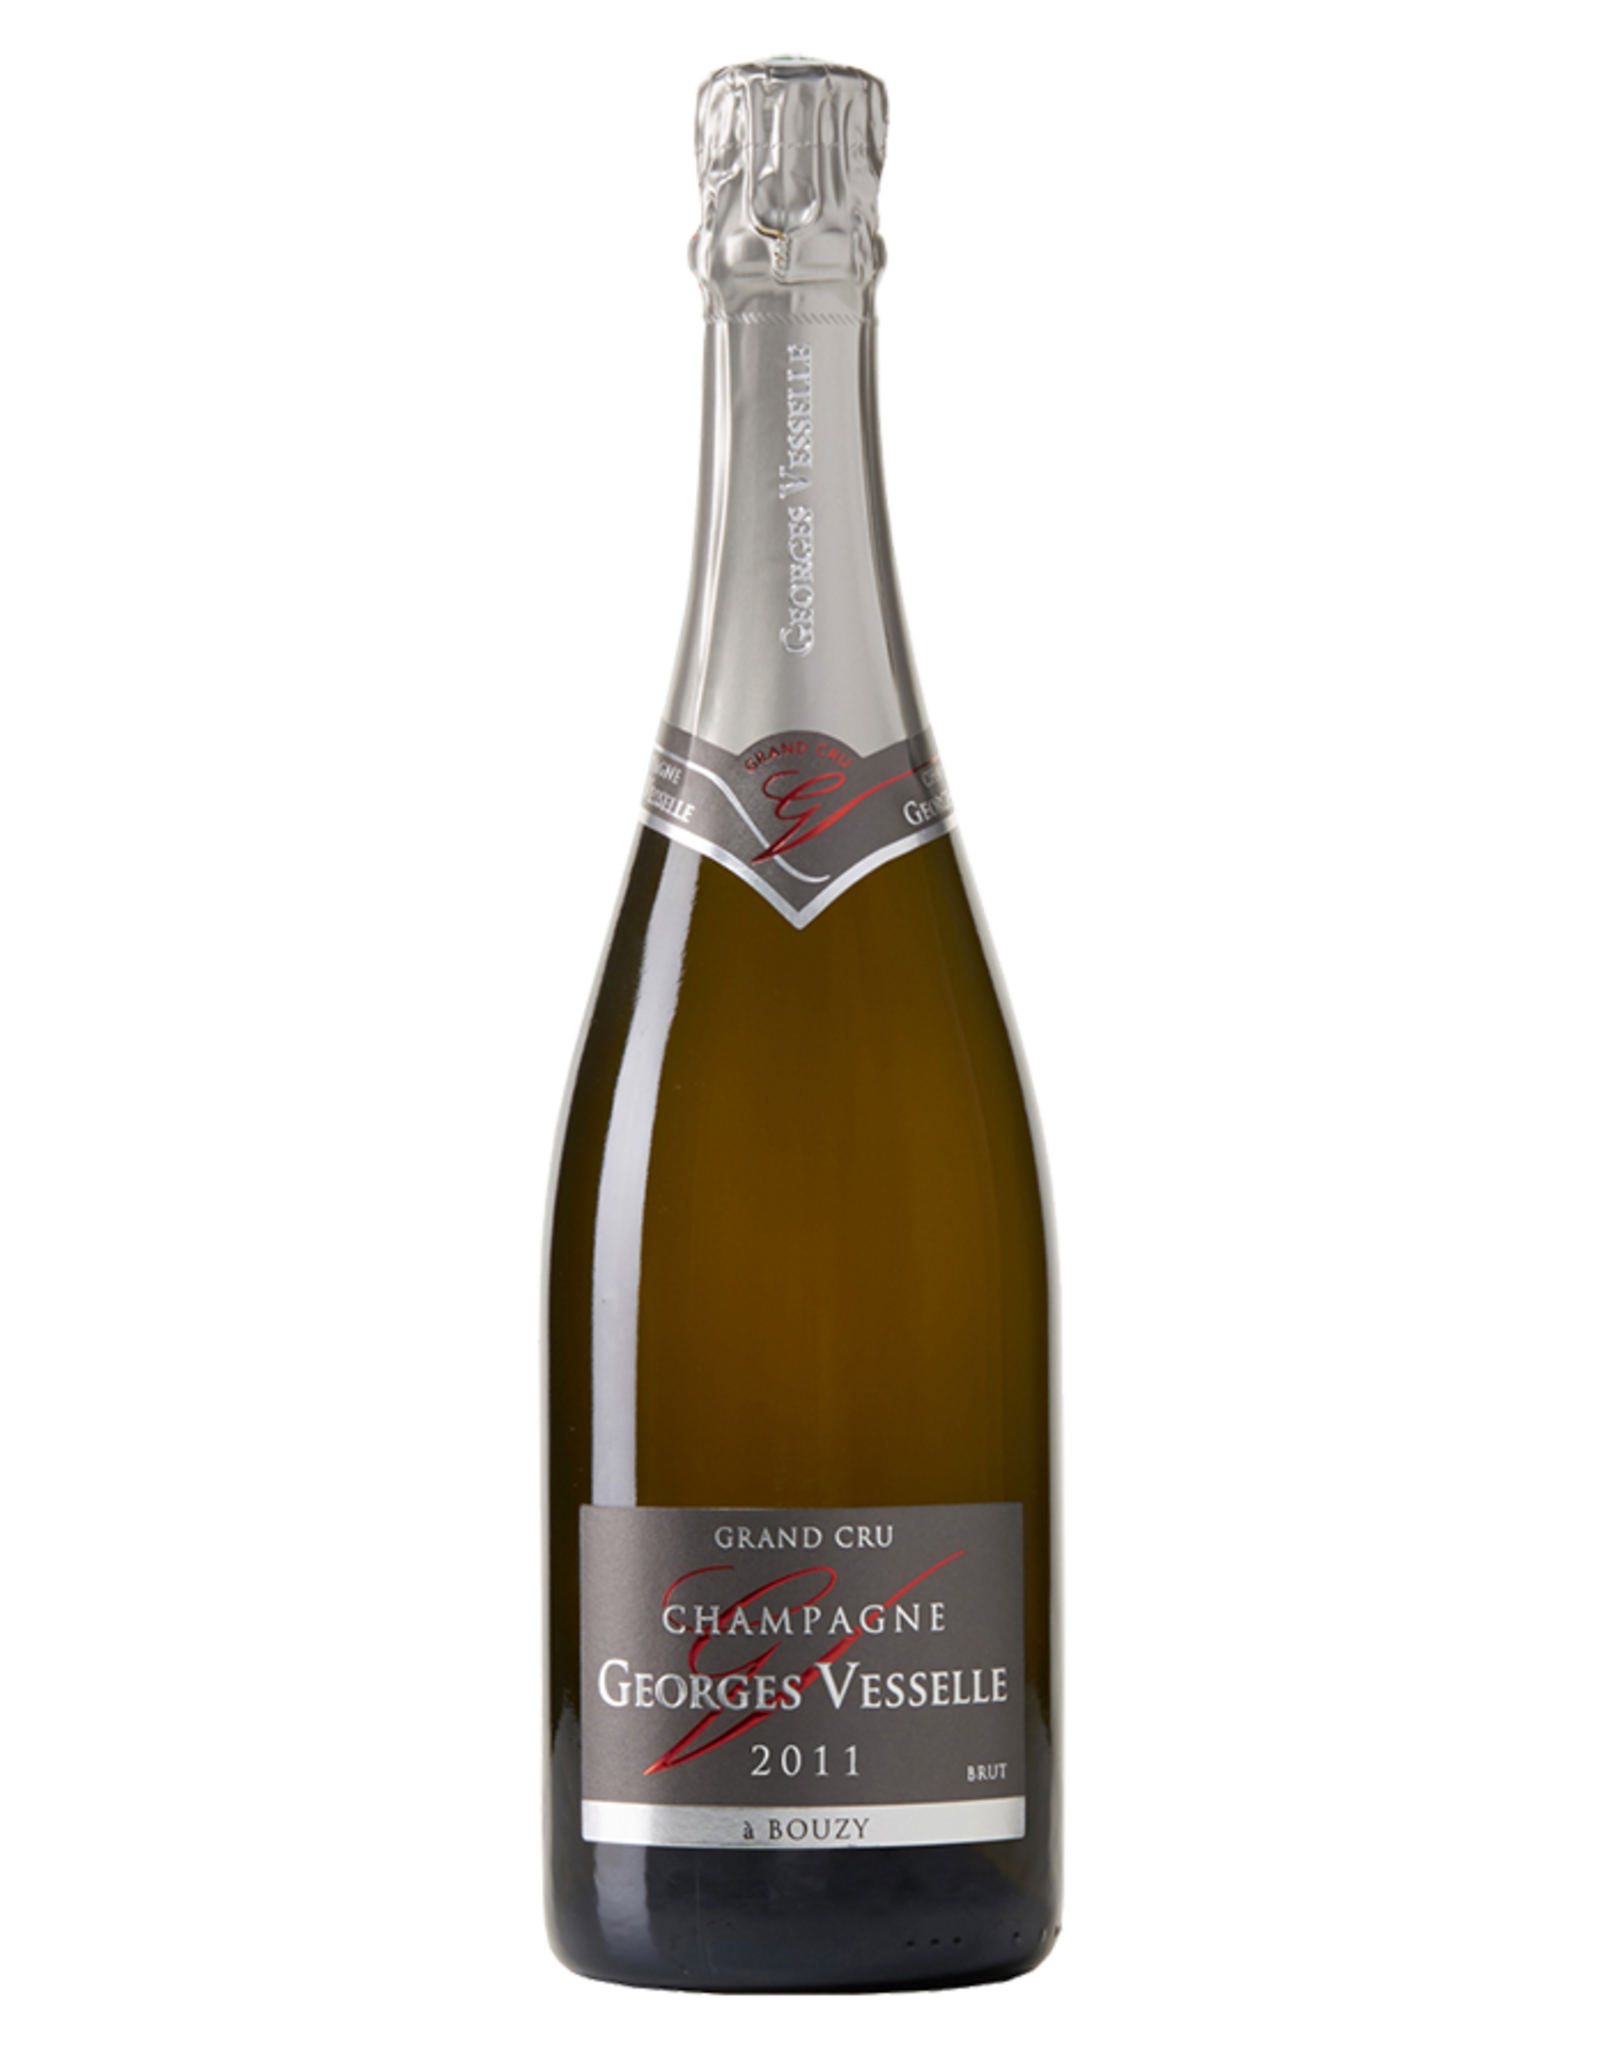 Georges Vesselle Champagne Georges Vesselle Brut Millesime Grand Cru 2011